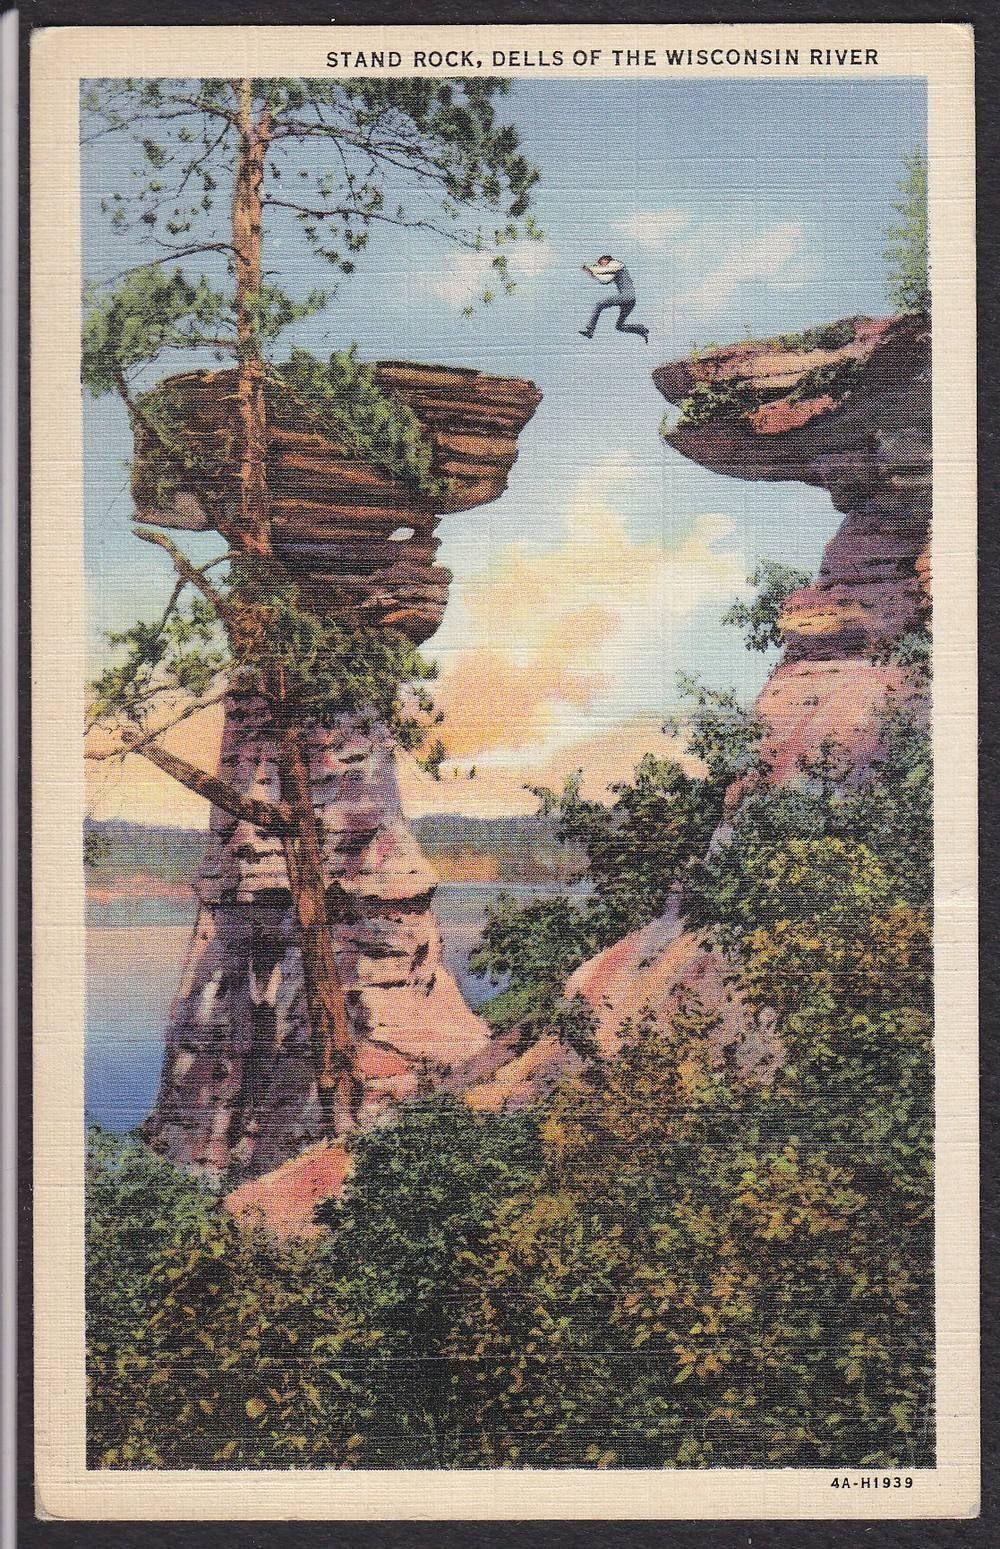 Wisconsin Dells-Stand Rock-River-Vintage Linen Postcard | eBay